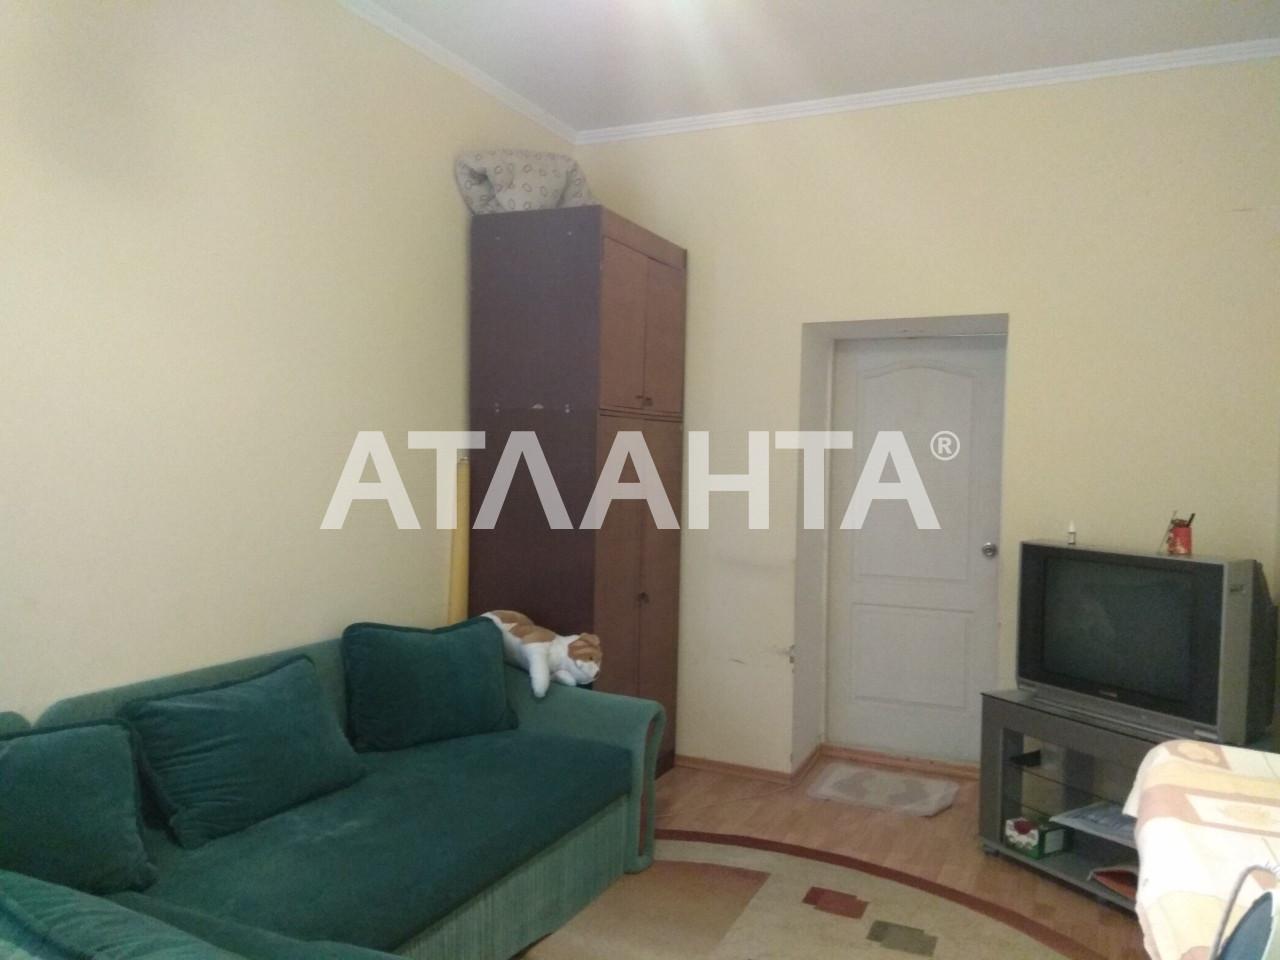 Продается 2-комнатная Квартира на ул. Стуса Василя (Володарского) — 41 000 у.е. (фото №2)